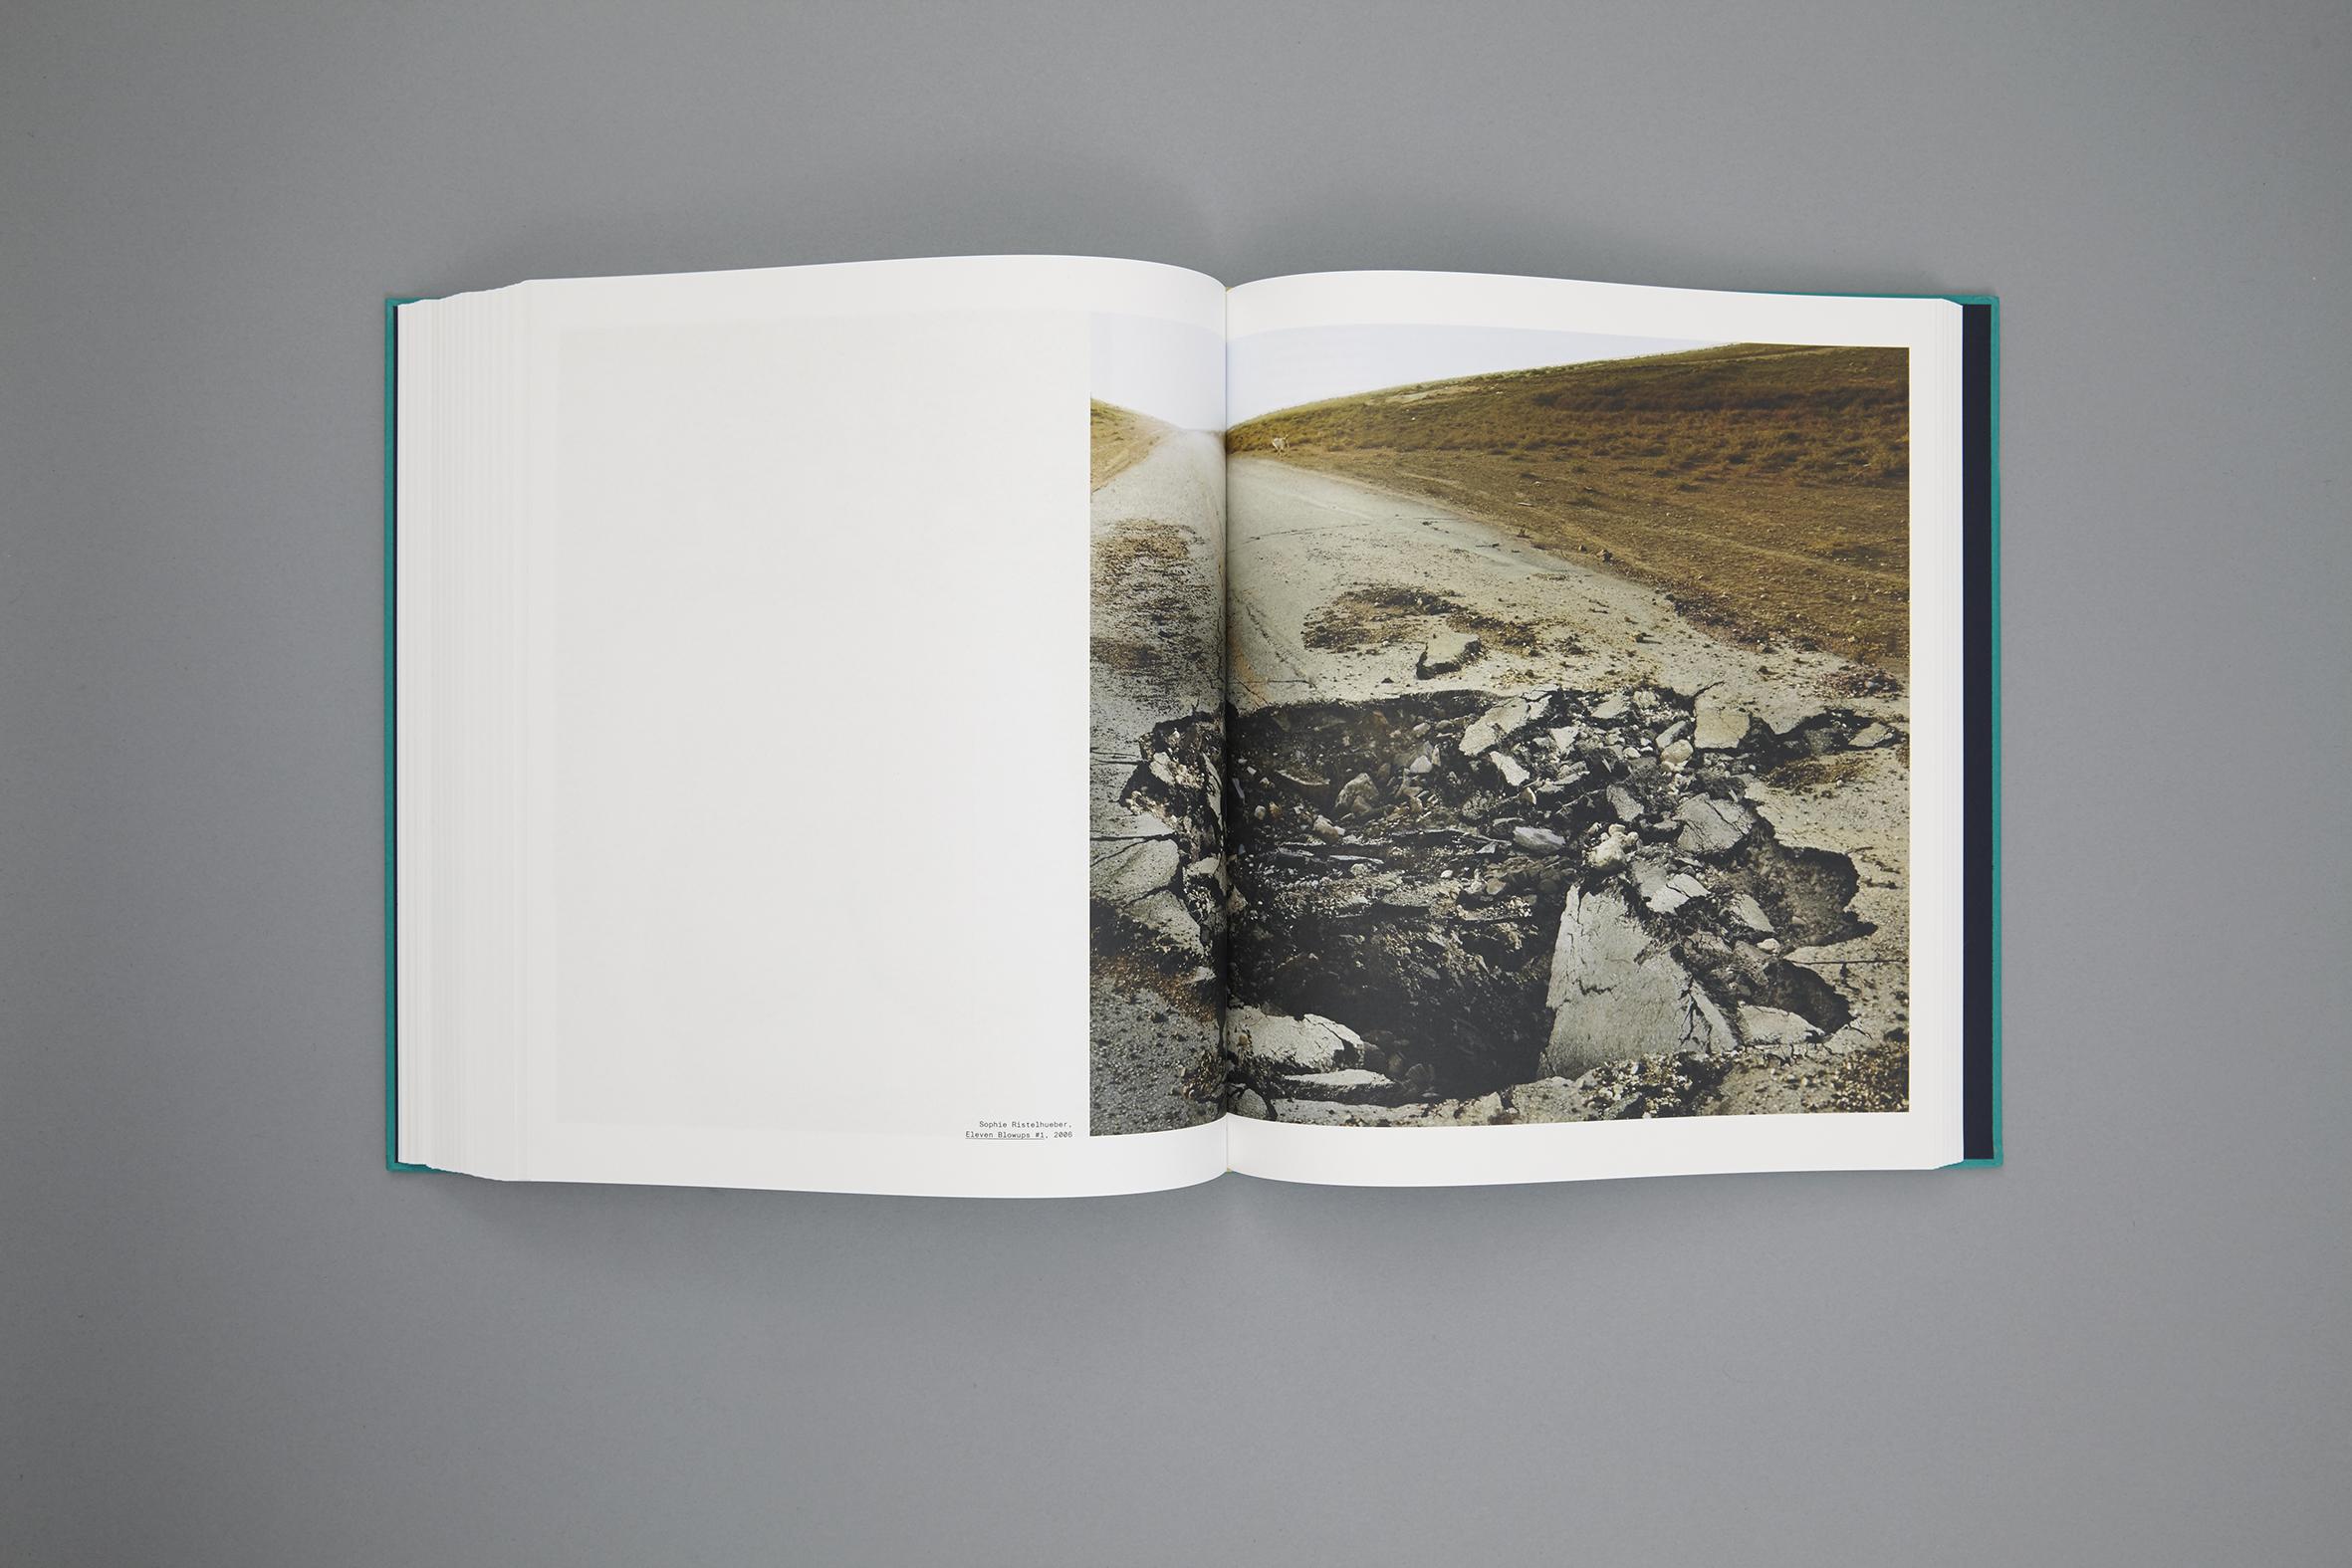 lebart-robert-dahan-histoire-mondiale-femmes-photographes-delpire-co-7